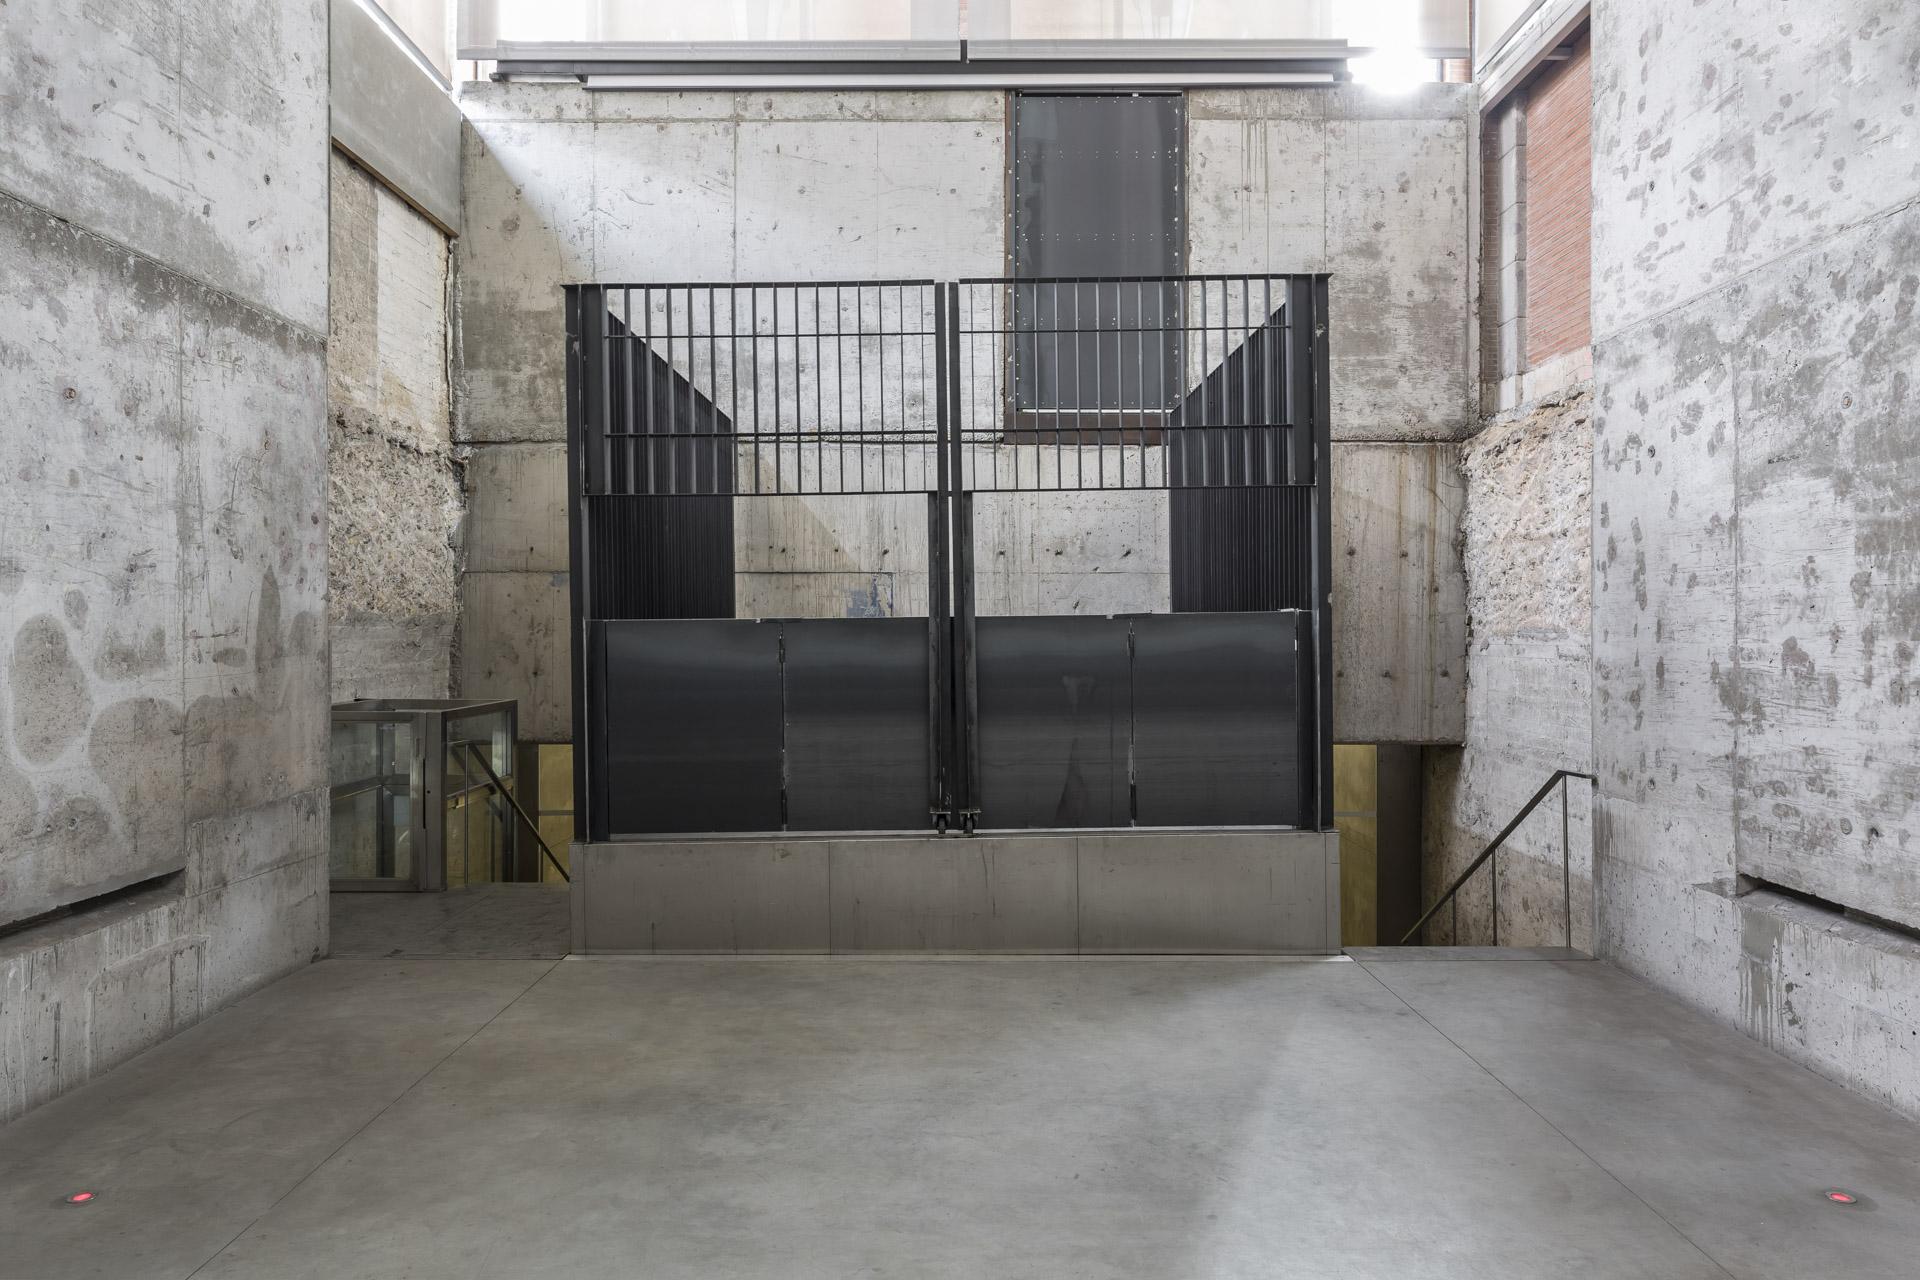 fotografia-arquitectura-madrid-nuevos-ministerios-elorza-german-cabo-23